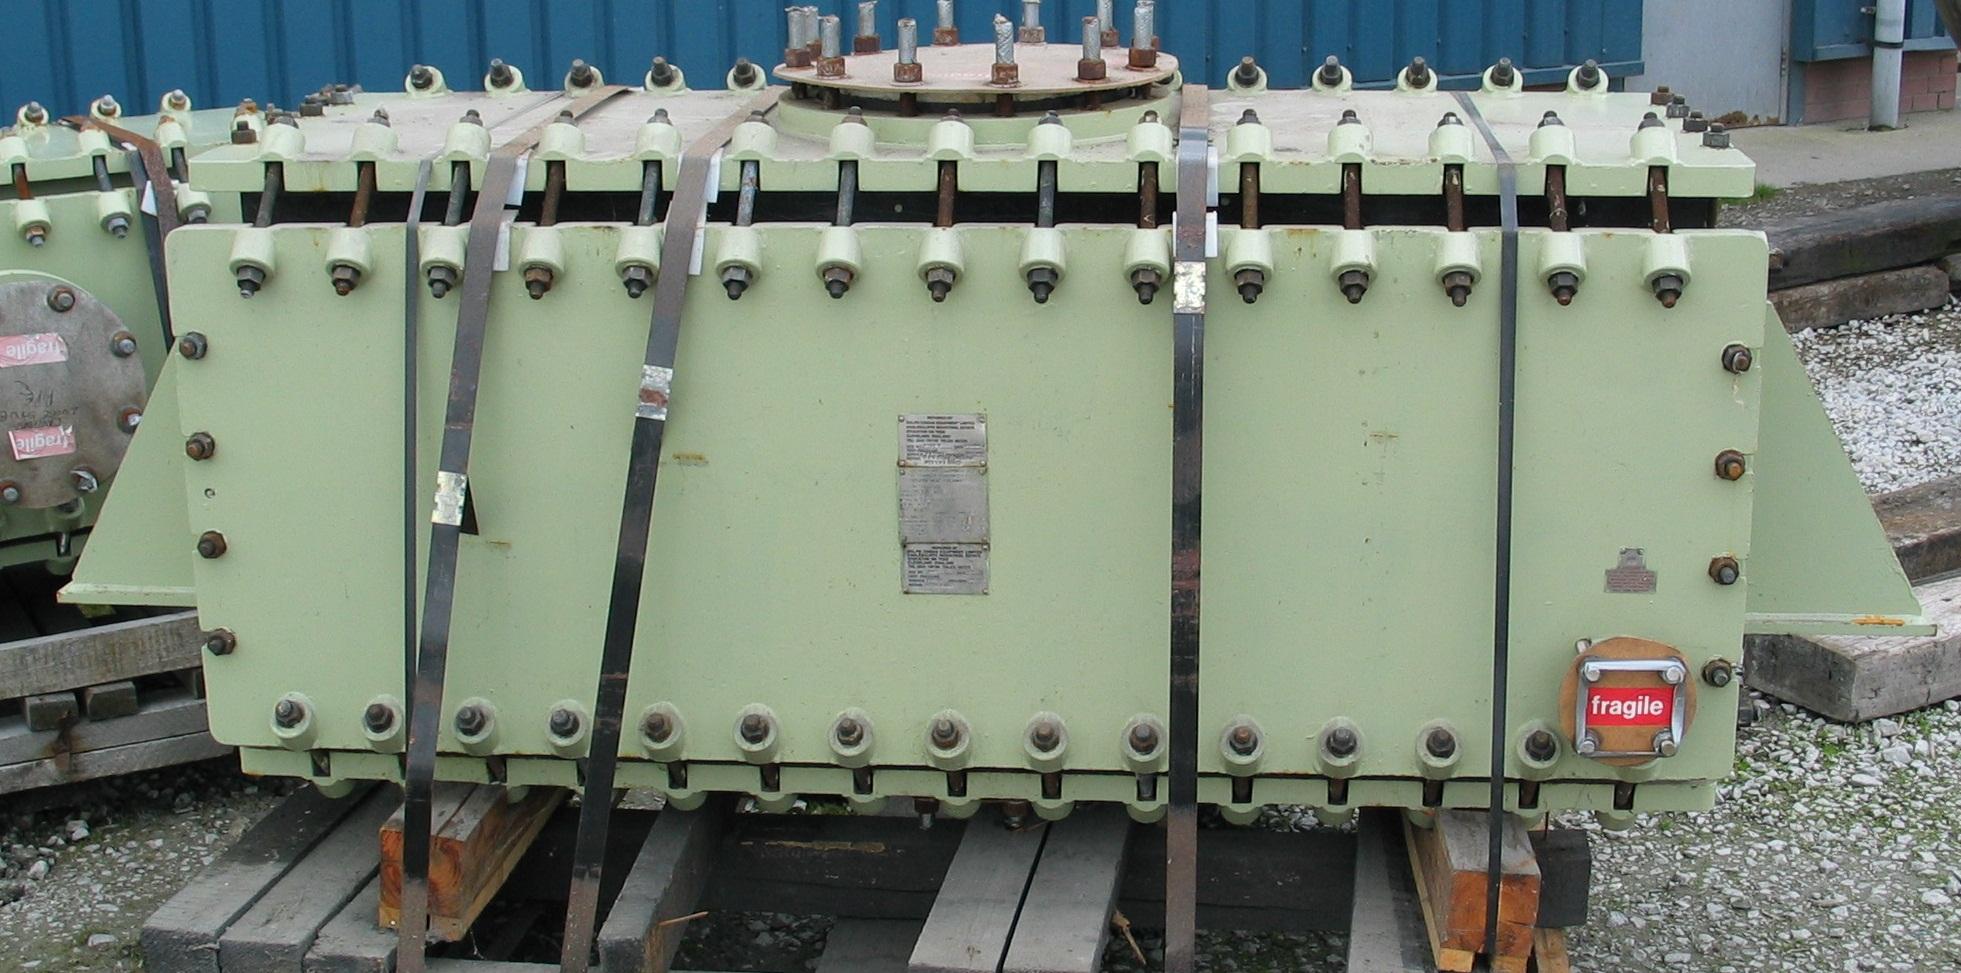 30 Sq. Meter Ralph Coidan V Graphite Block Heat Exchanger